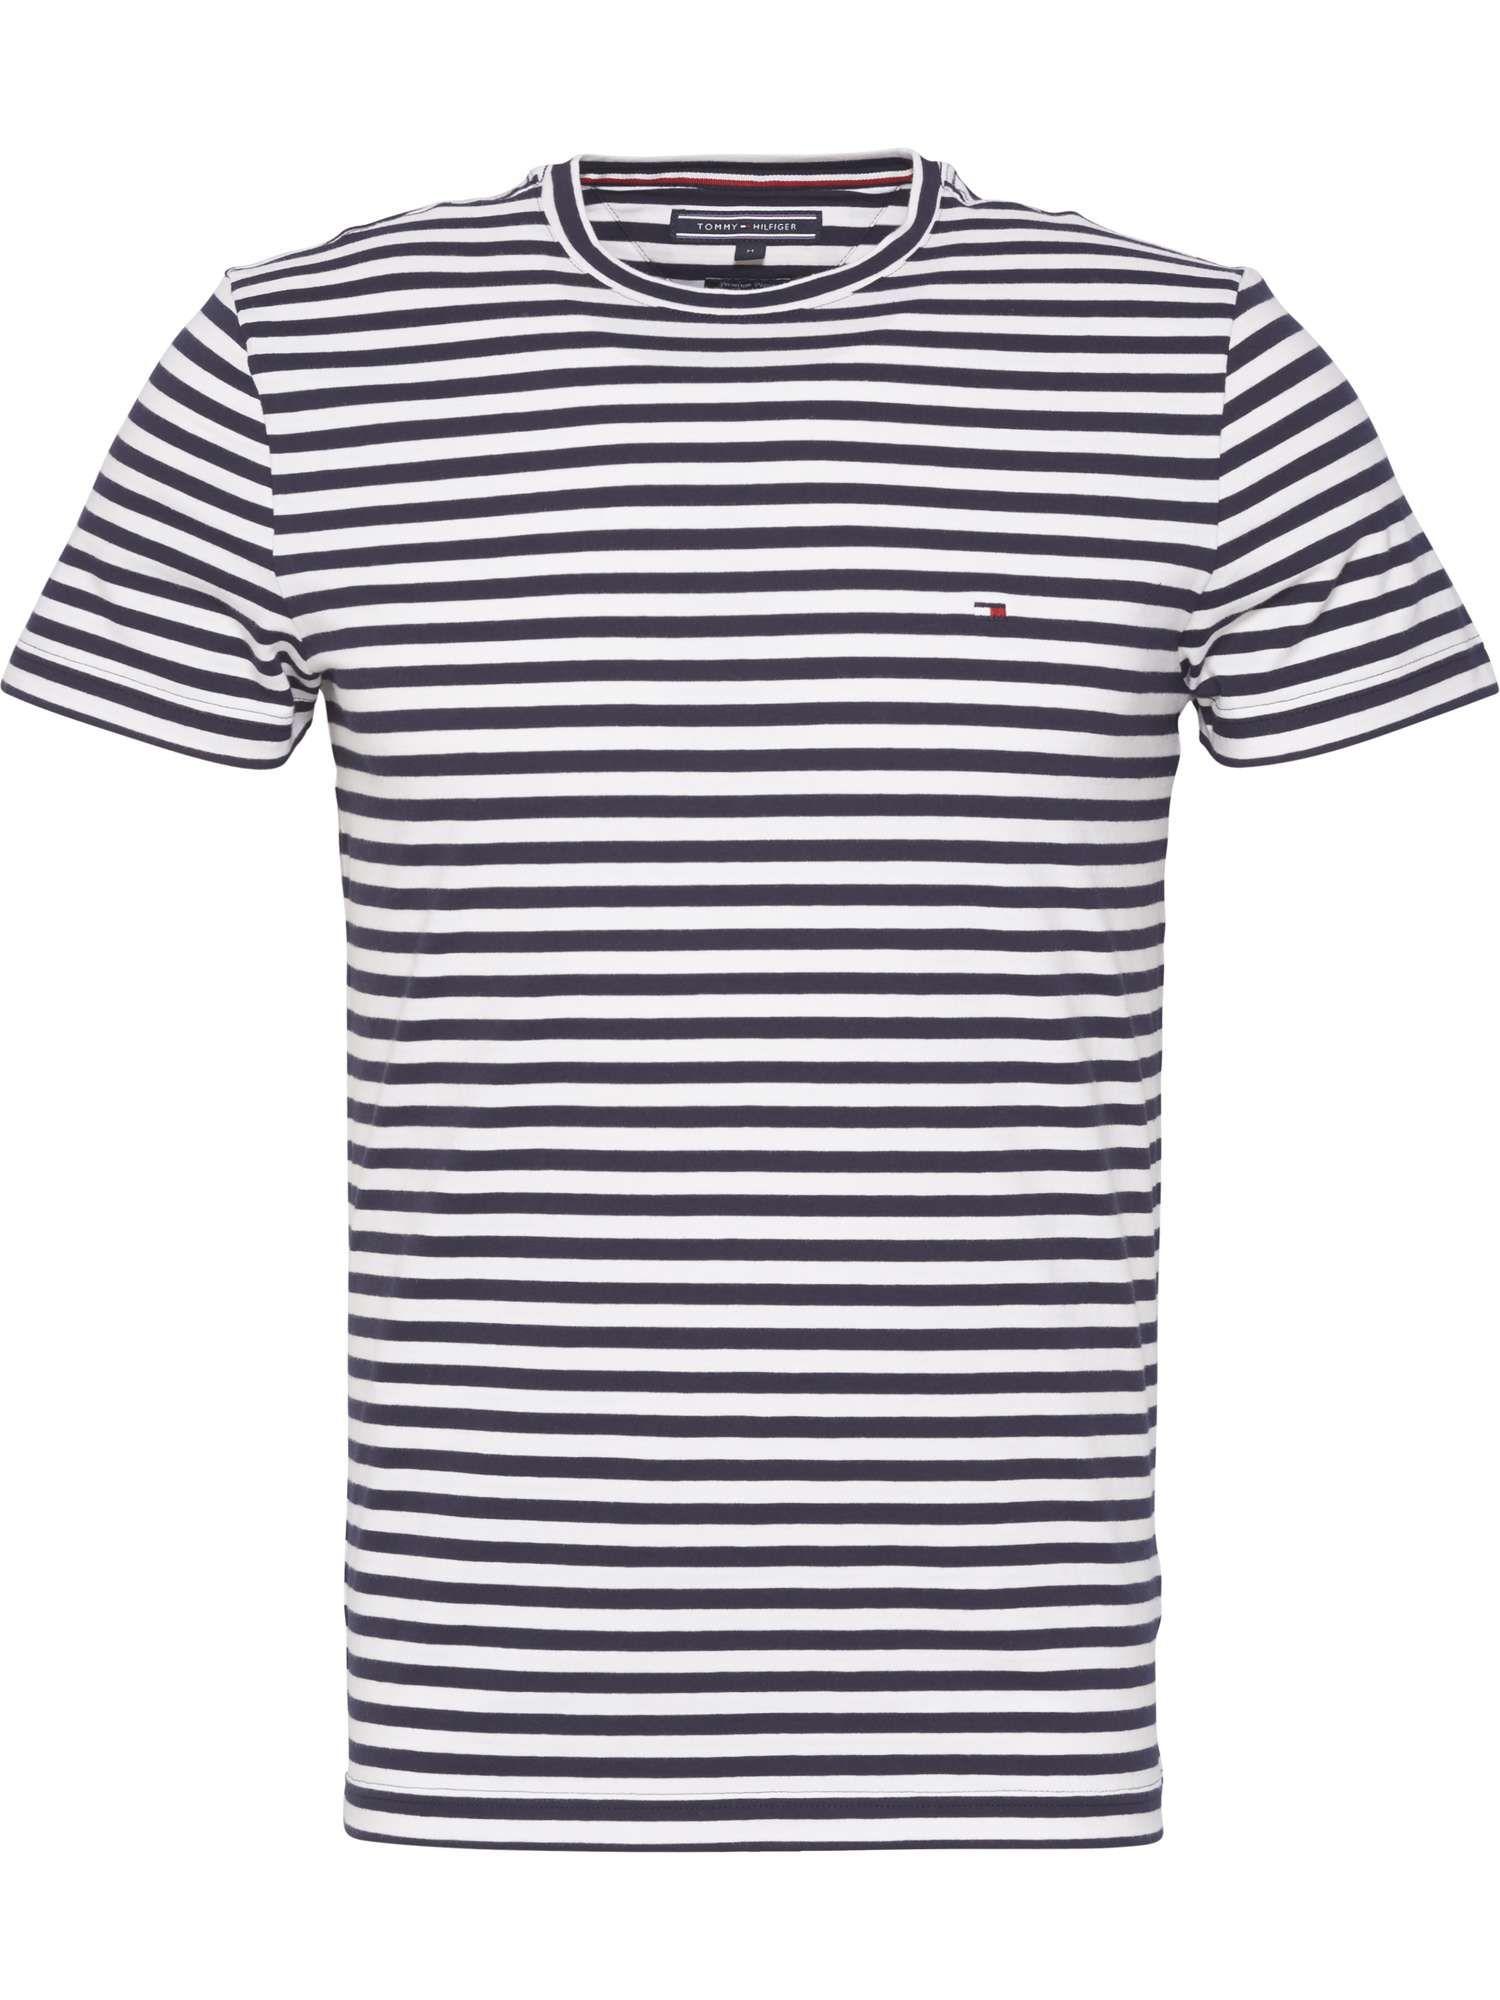 57f0a990 Tommy Hilfiger Nautical Stripe T-shirt - House of Fraser   T E E ...